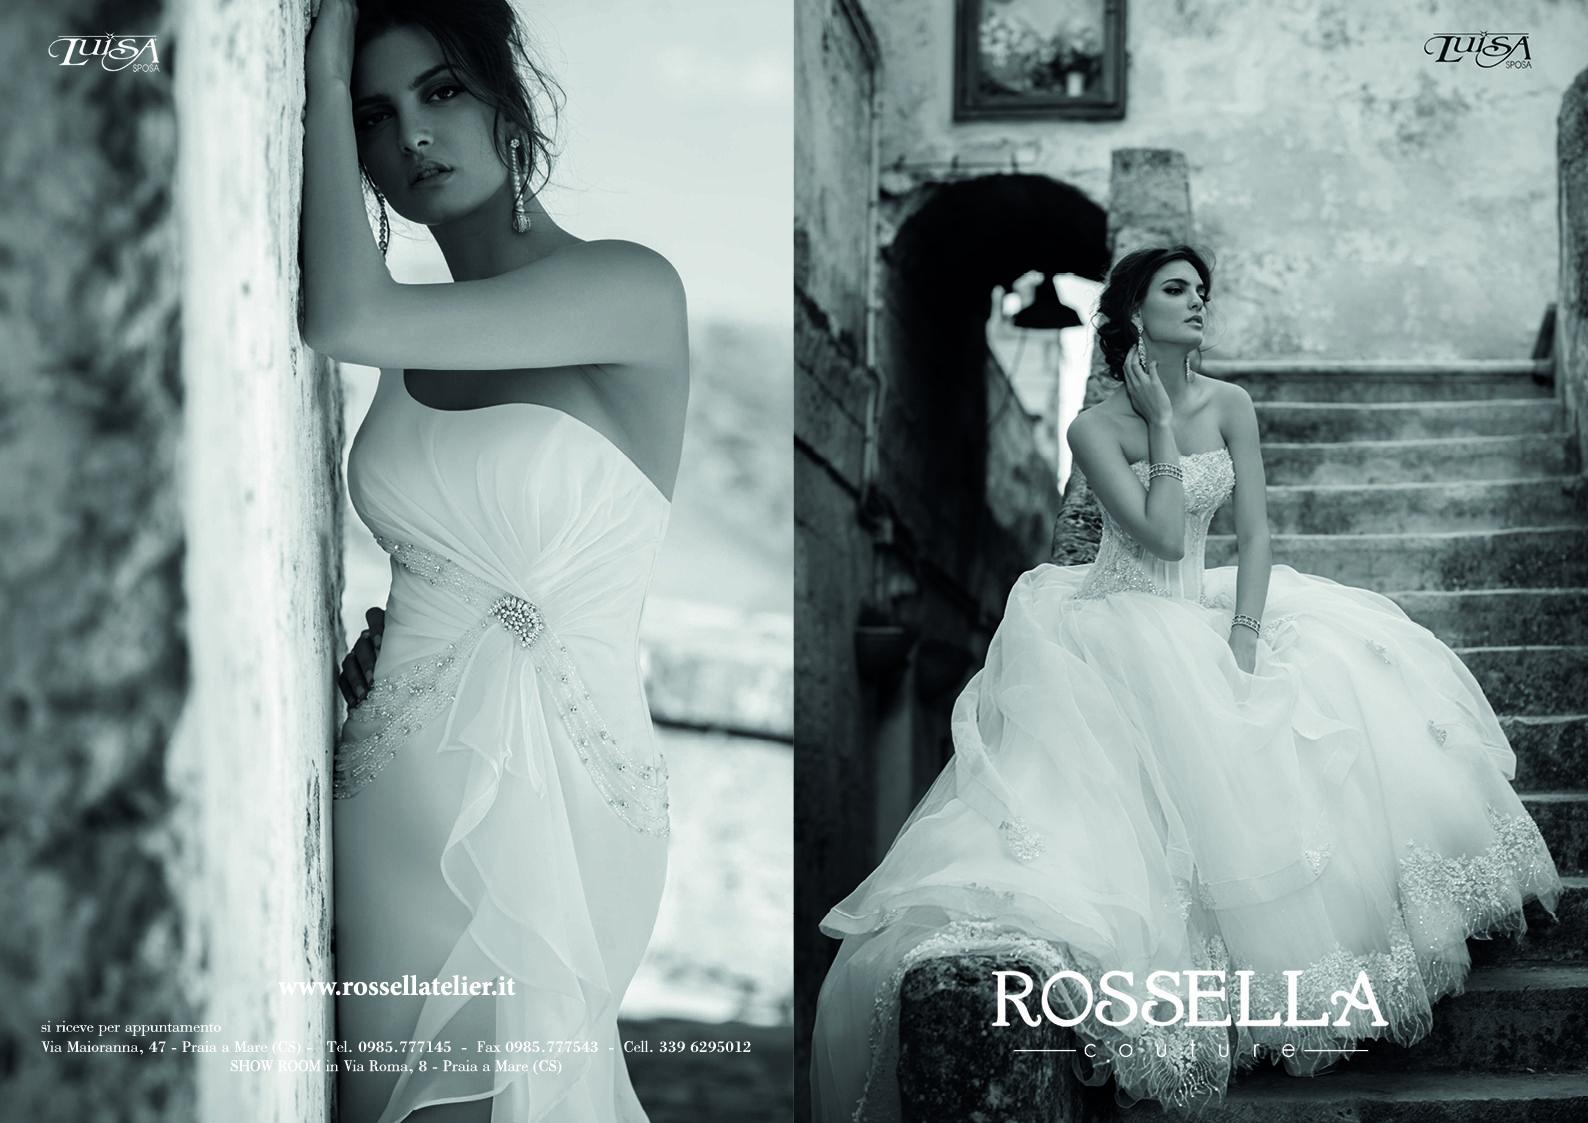 Rossella Atelier  Praia a Mare (CS)